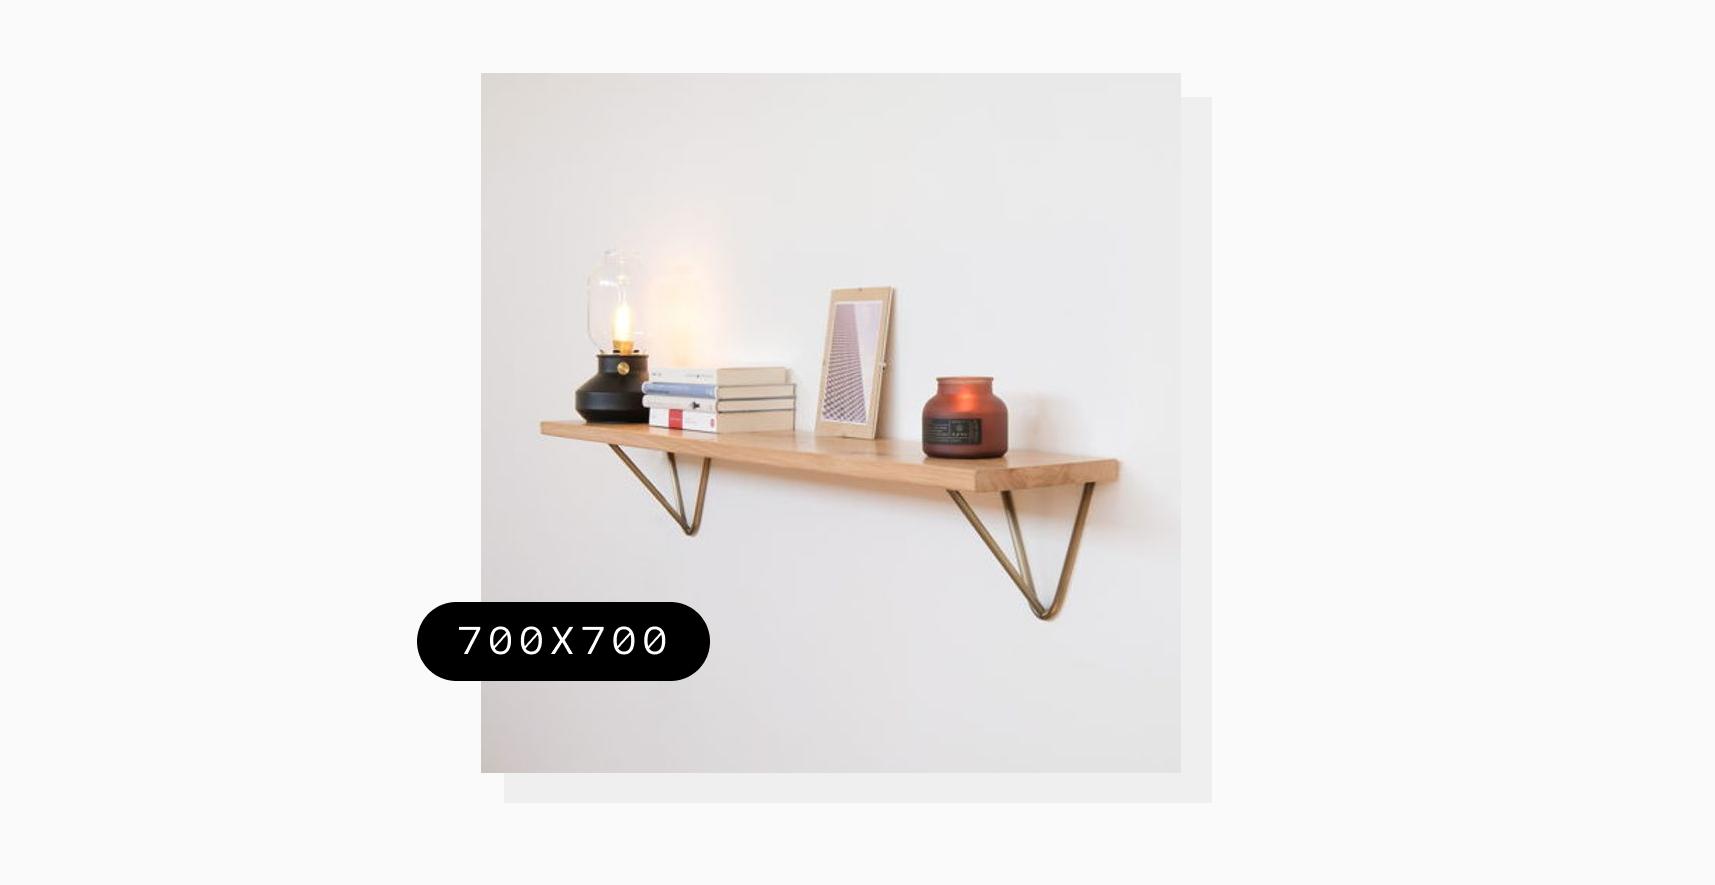 resized photo of a shelf on a wall